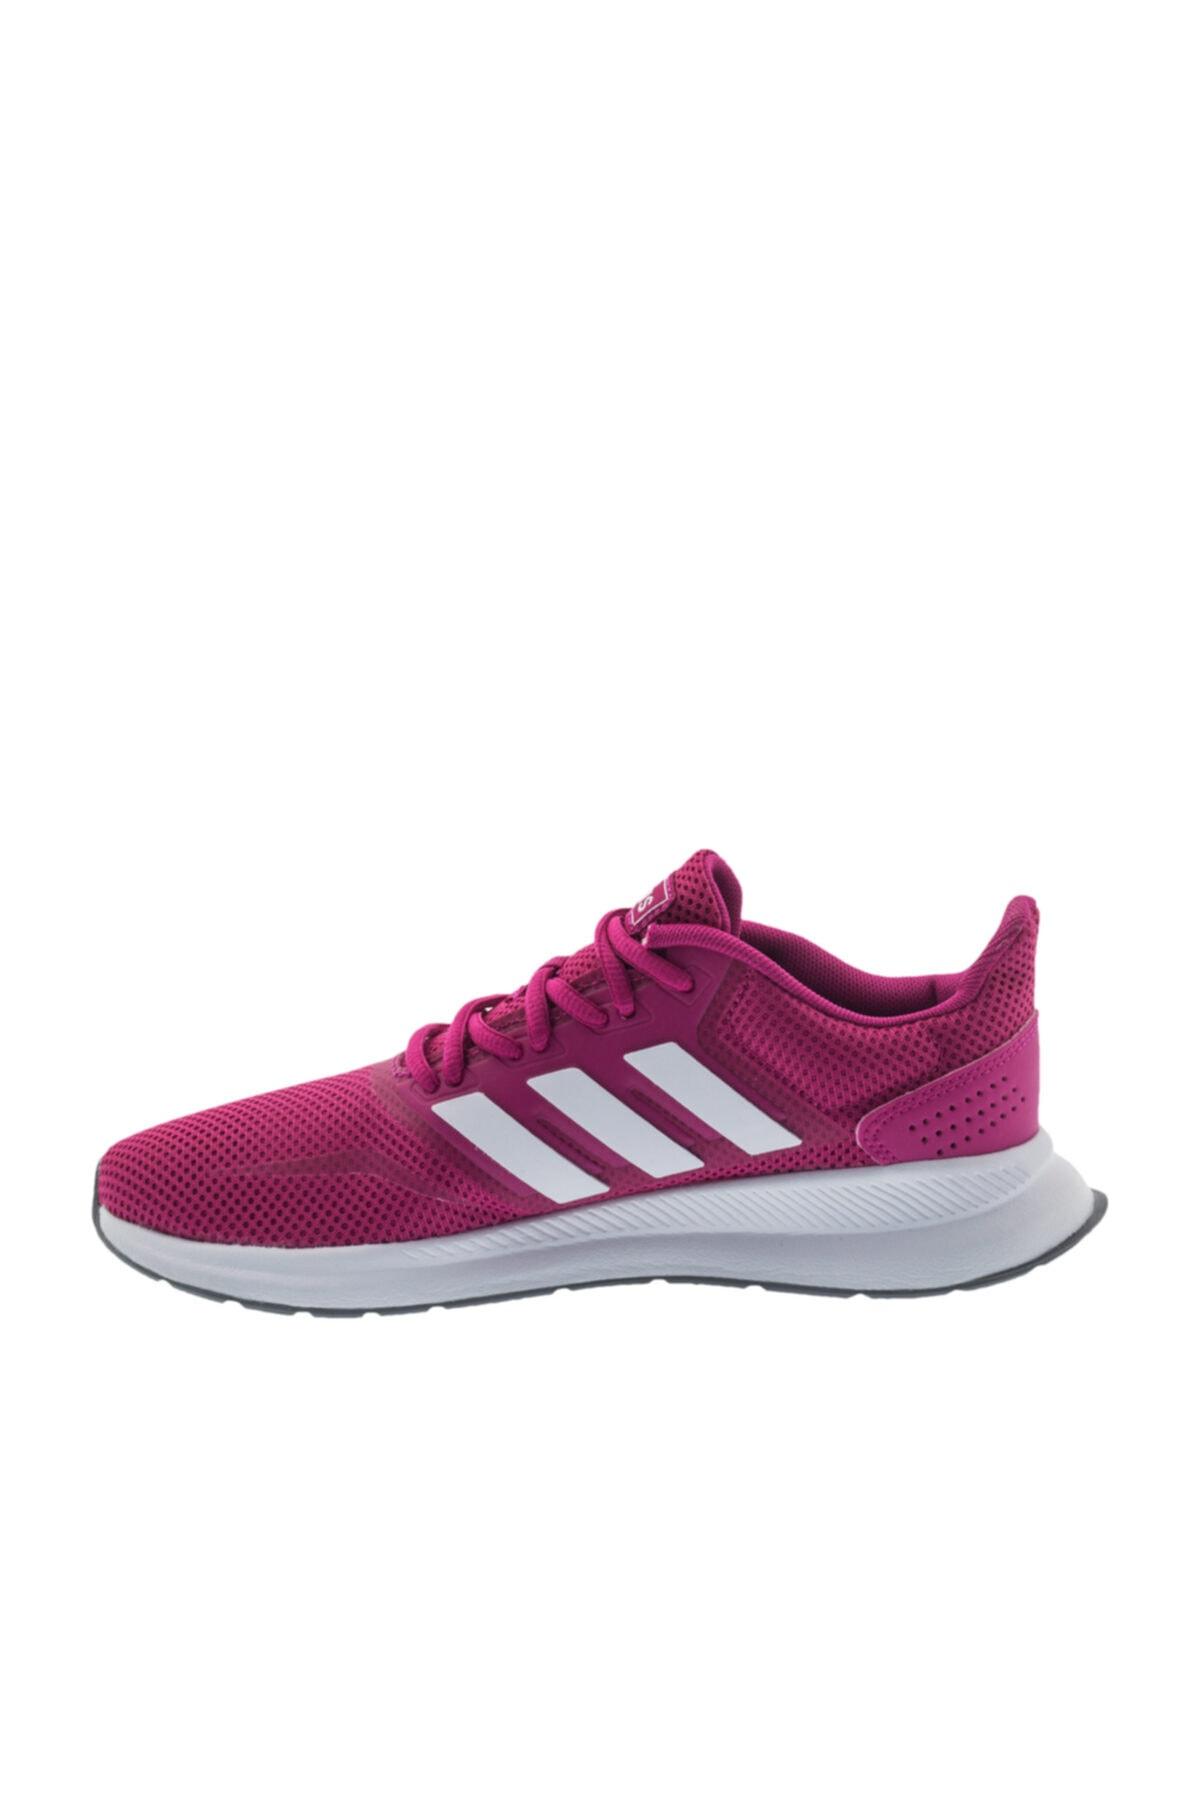 adidas Runfalcon Pembe Spor Ayakkabı (f36219) 2